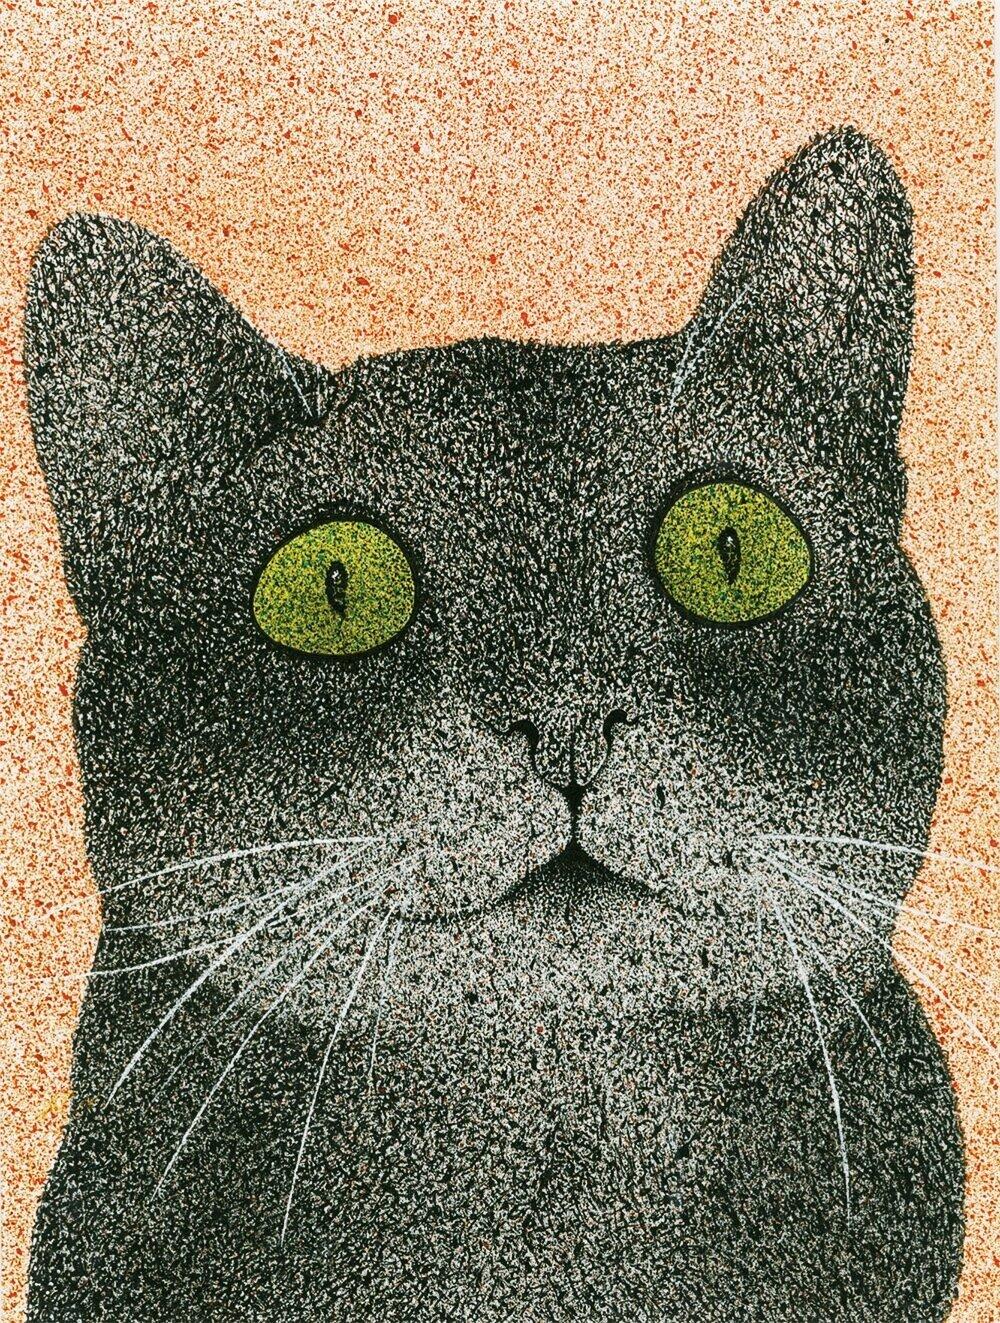 Black Cat Abbey